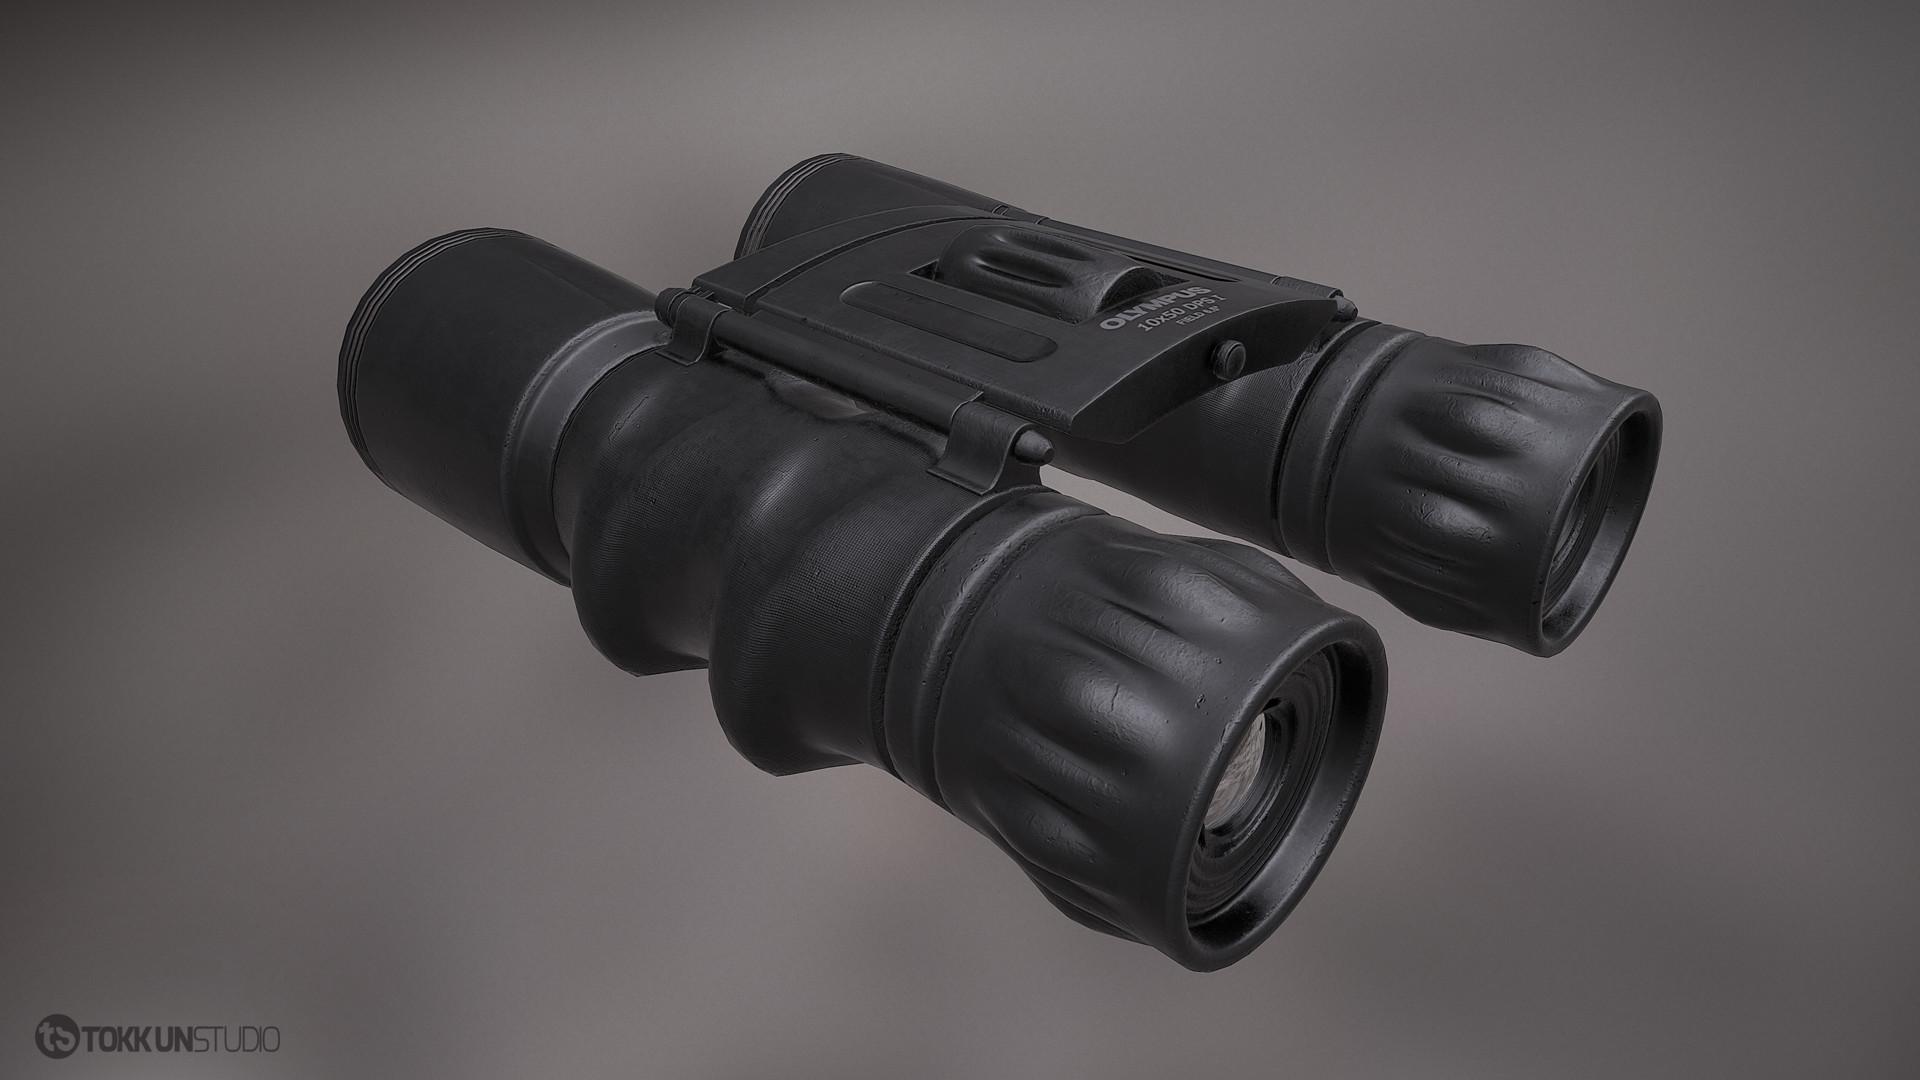 Tokkun studio binocular 2ts